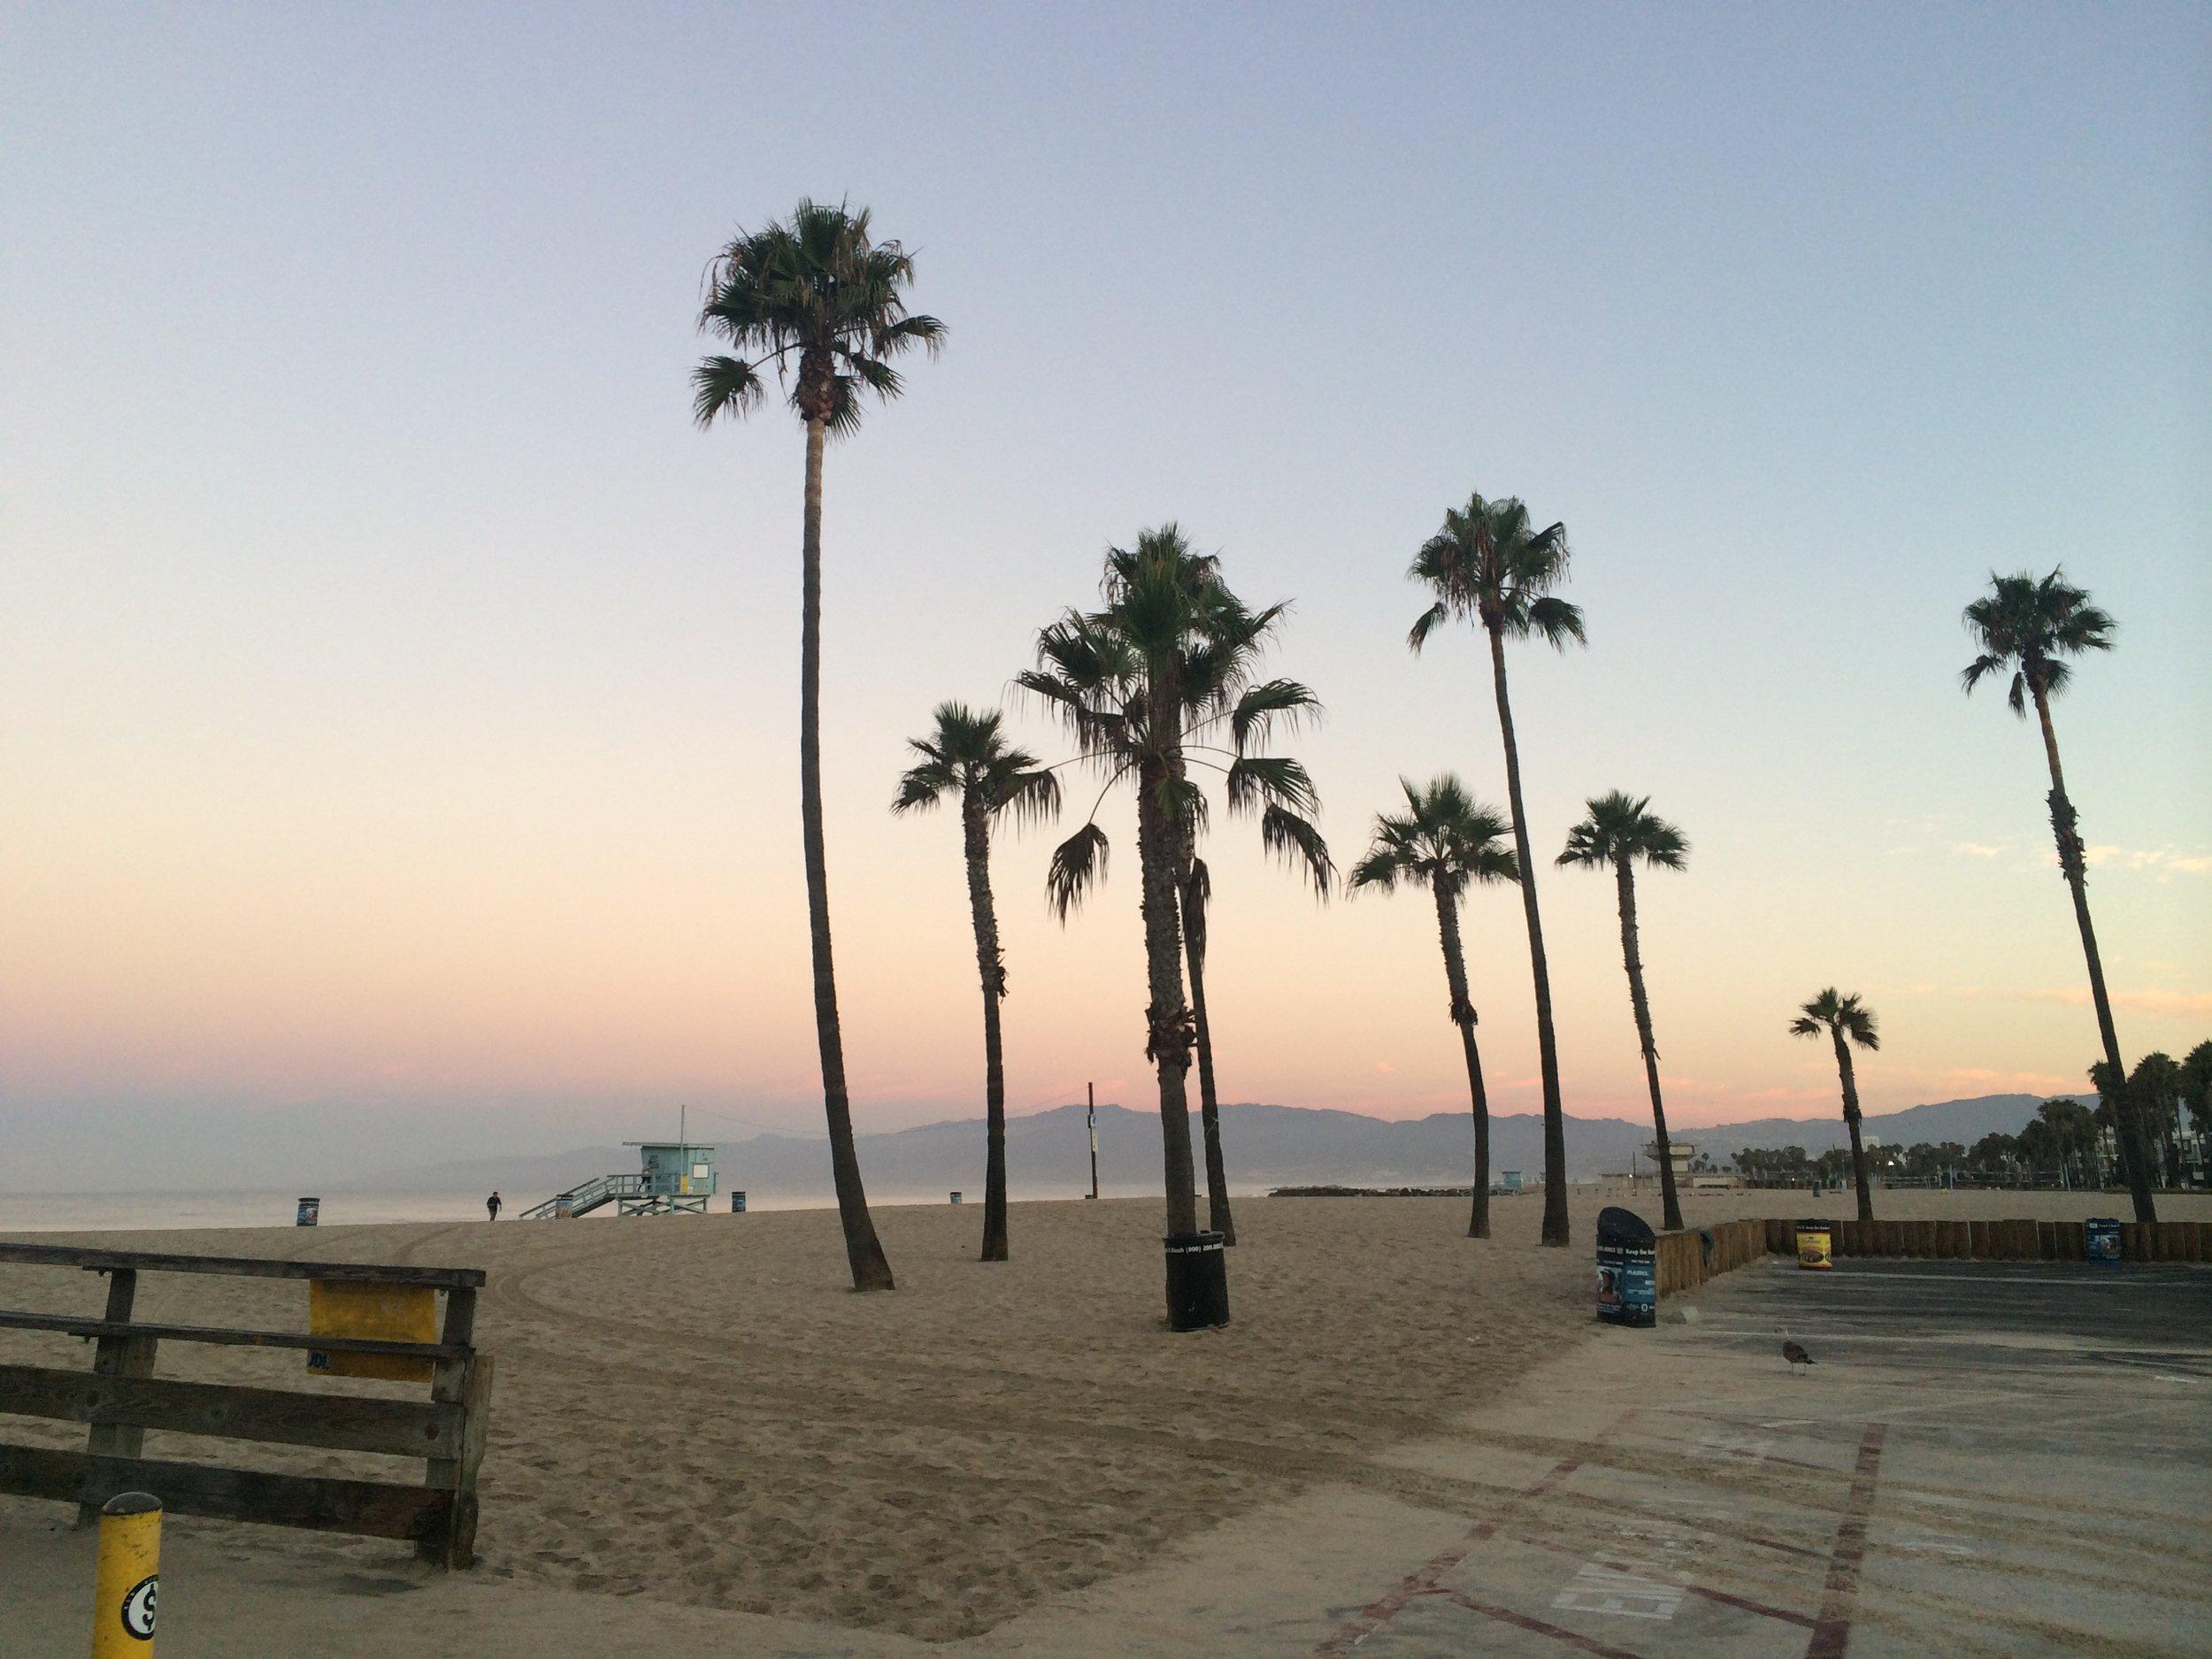 Venice Beach / Los Angeles, CA